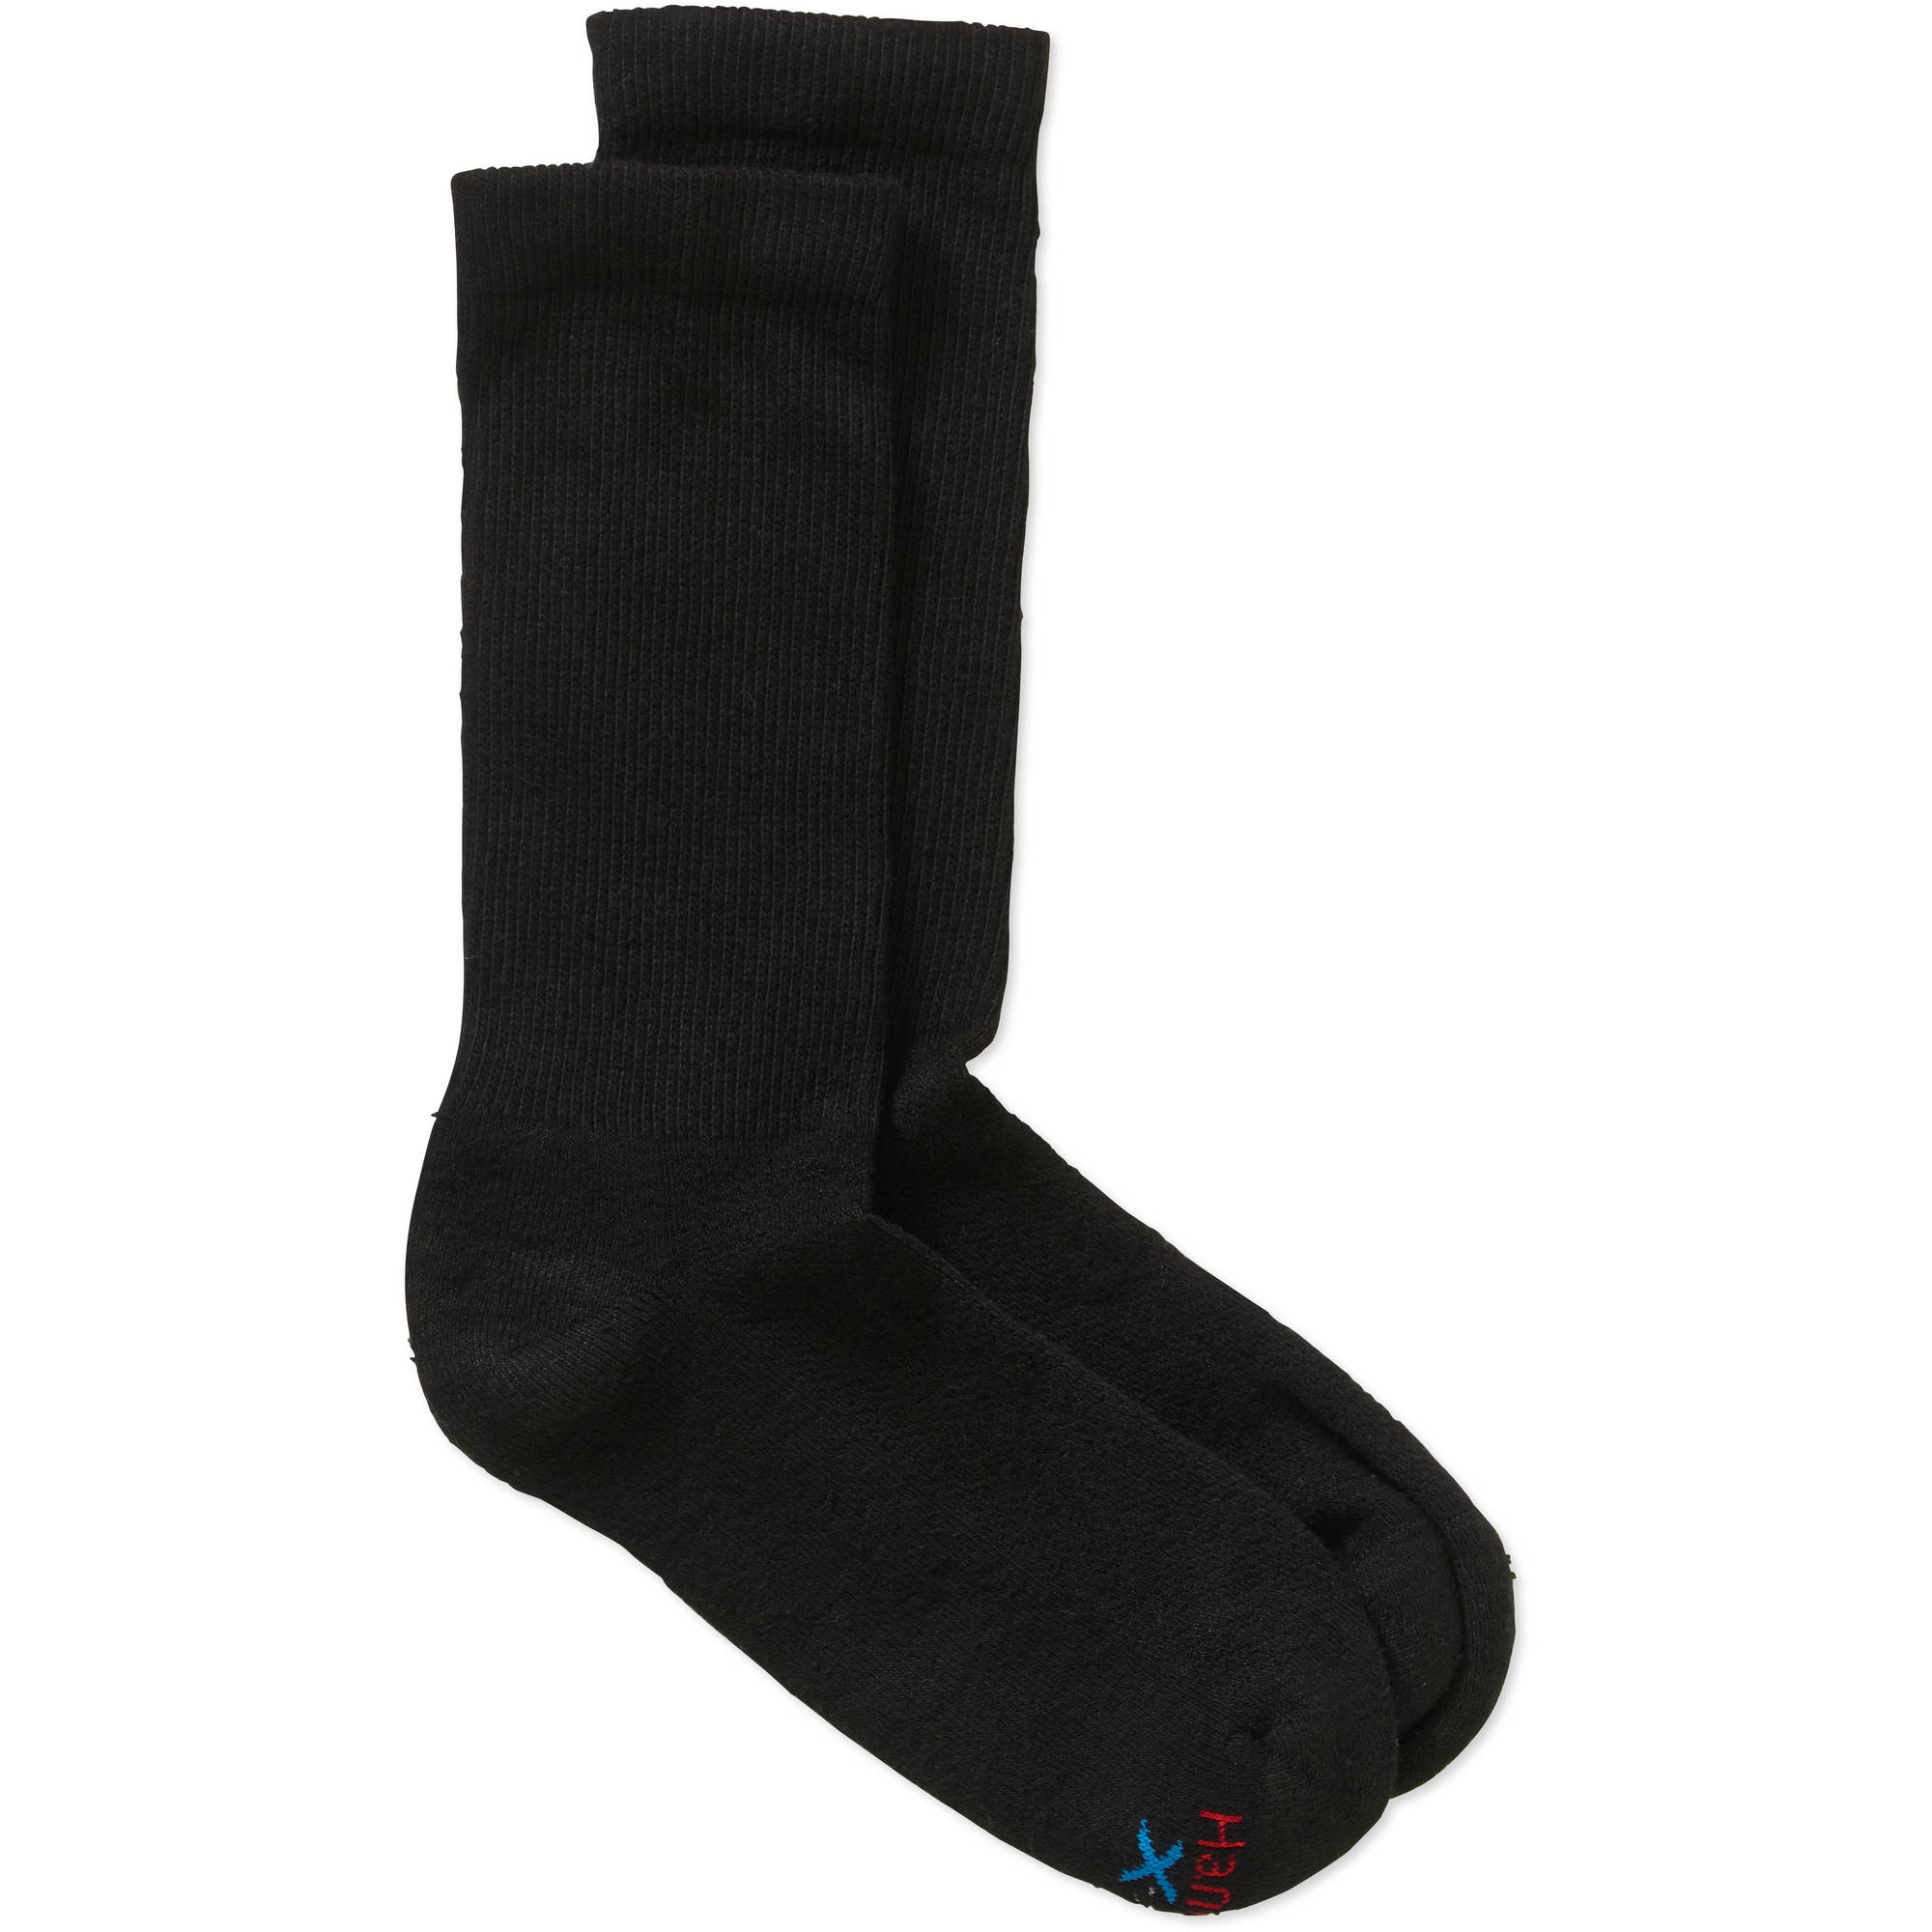 Hanes Men's Ultimate X-Temp Black Crew Socks, 5 + 1 Bonus Pack